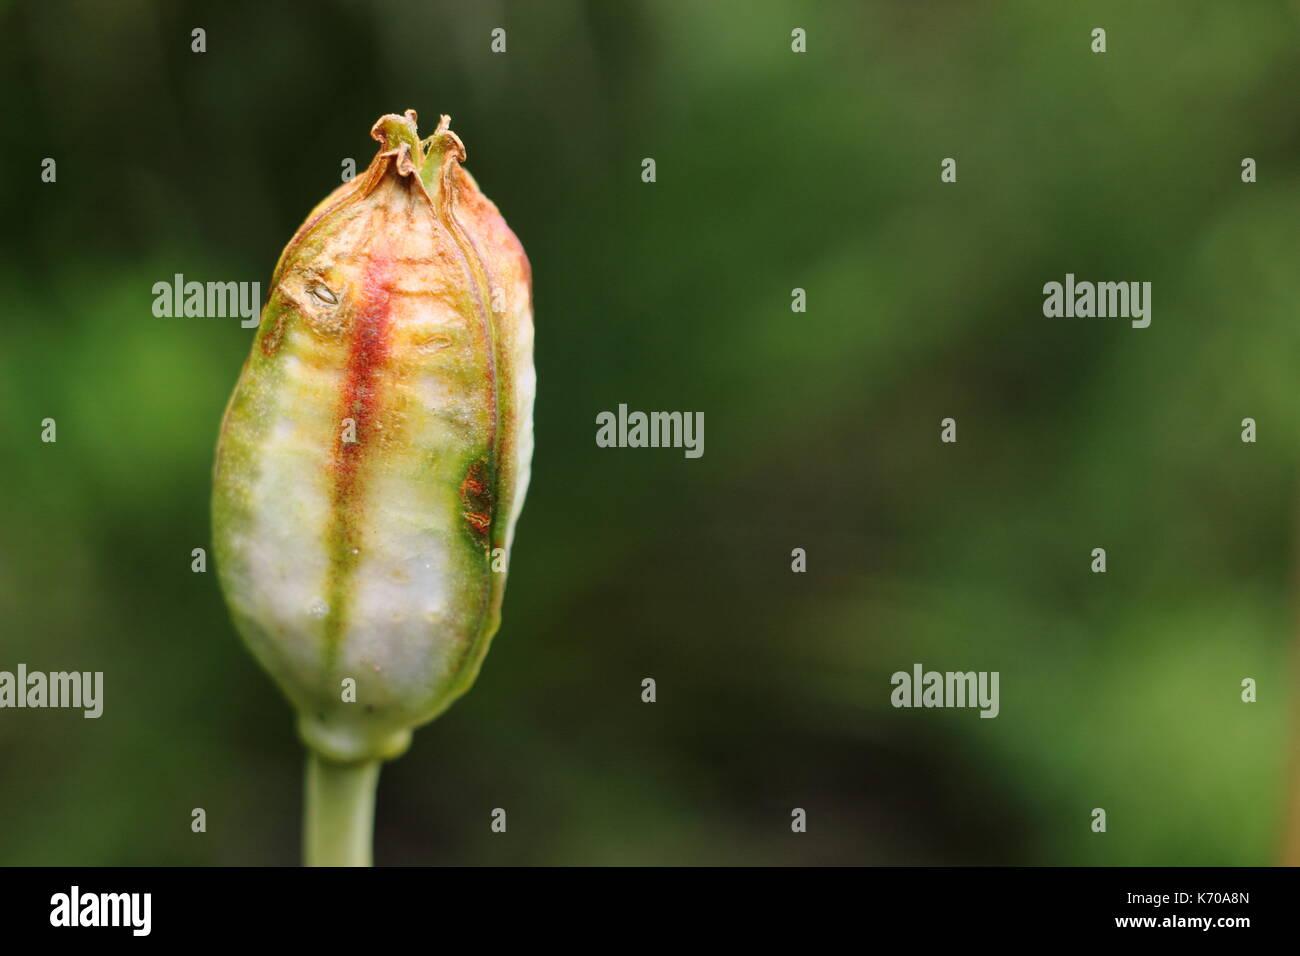 Seedhead of Sprenger's Tulip (Tulipa sprengeri), ripening in an English garden in summer - Stock Image